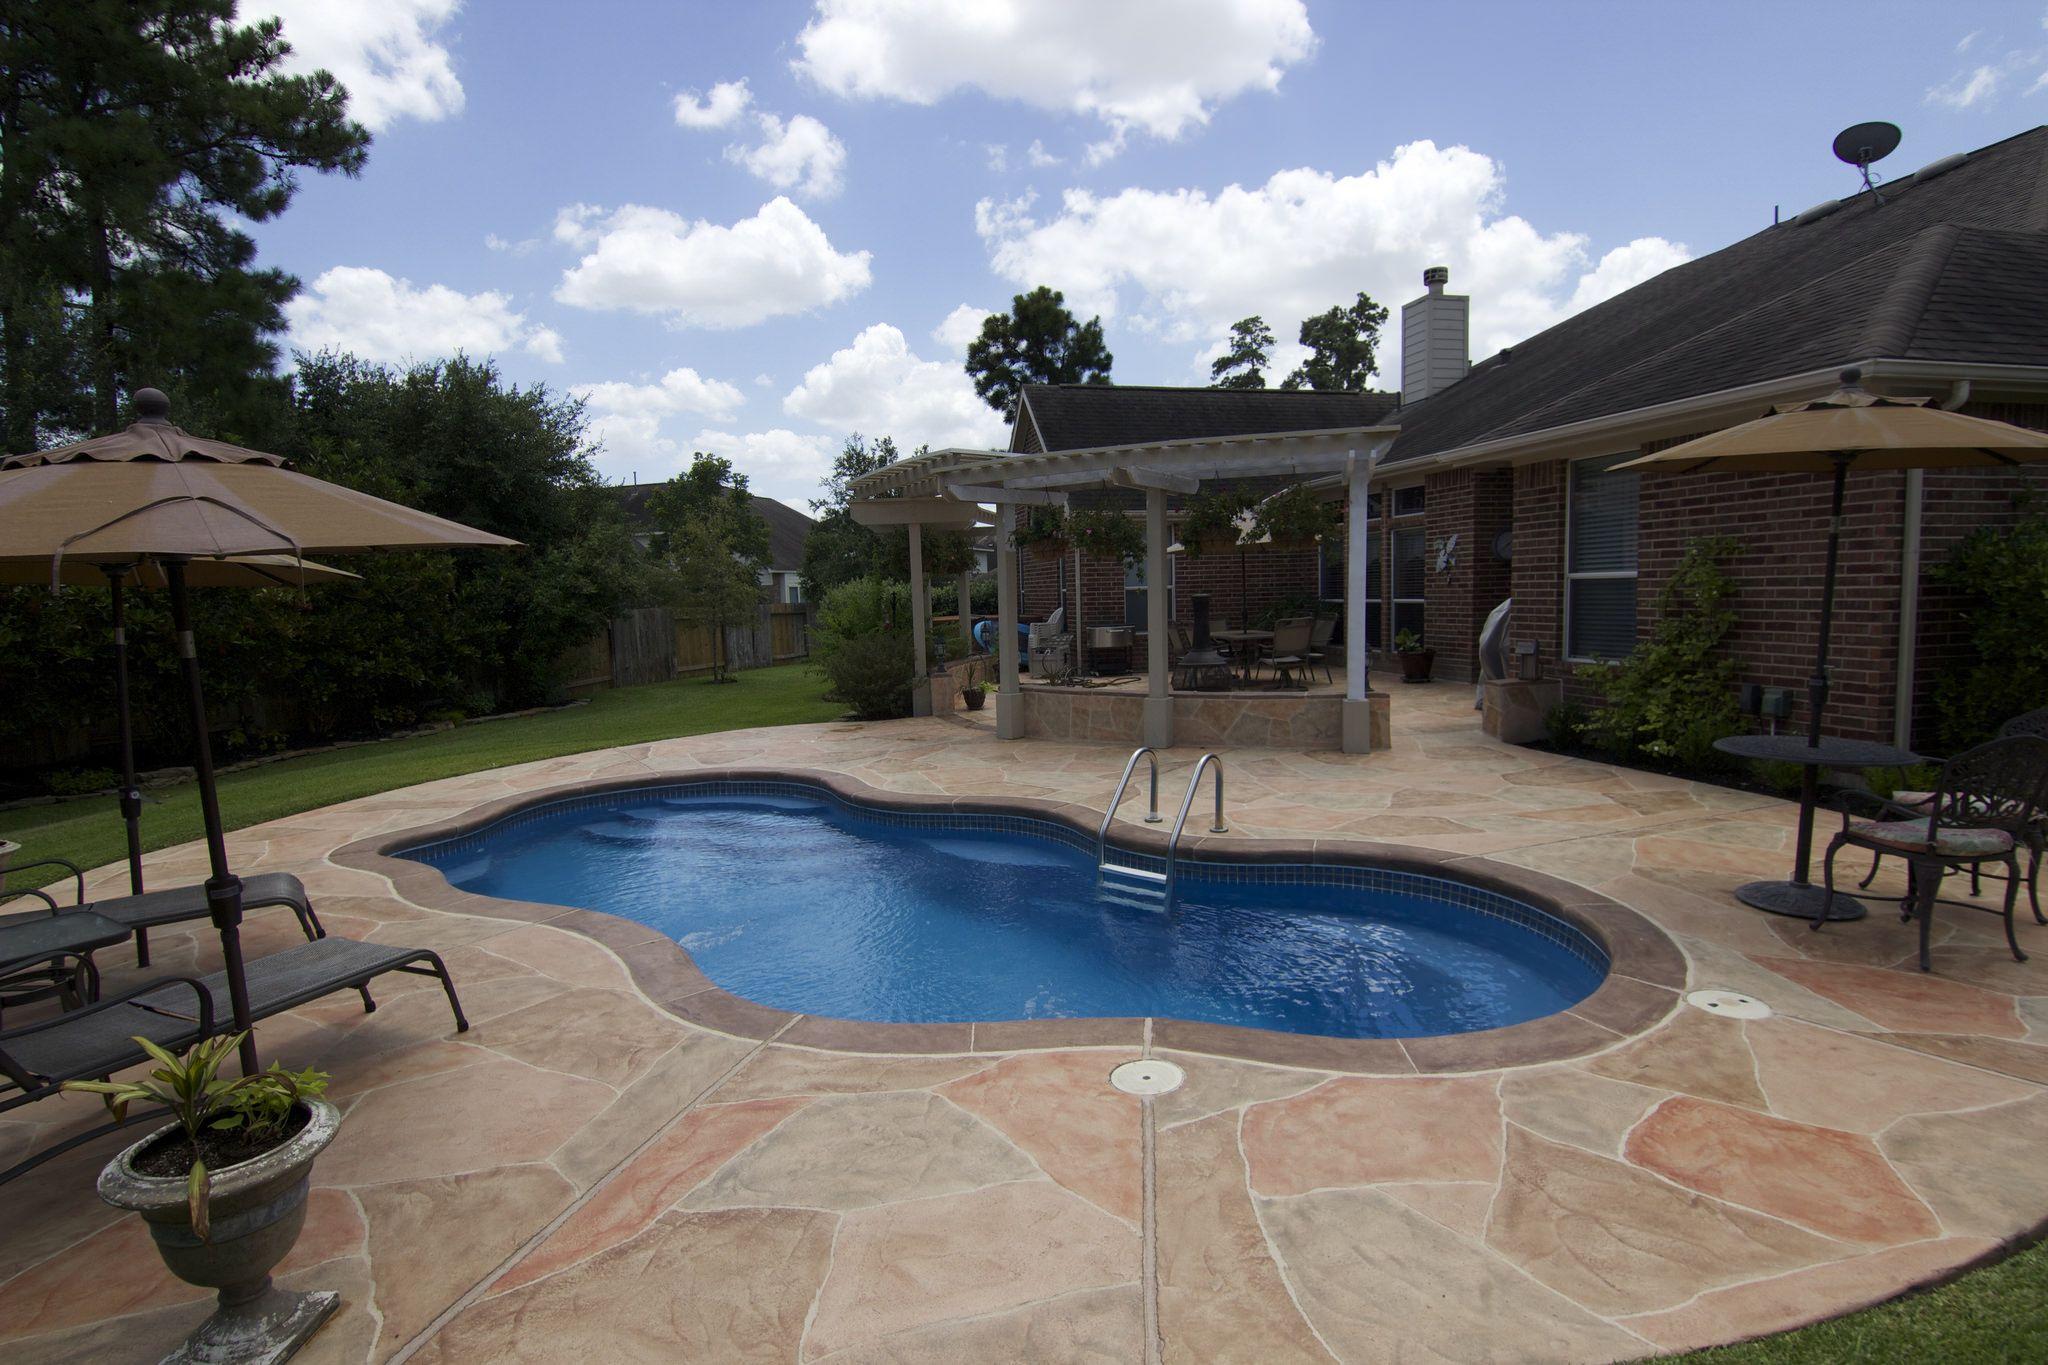 laguna deluxe fiberglass pools pool spa and backyard